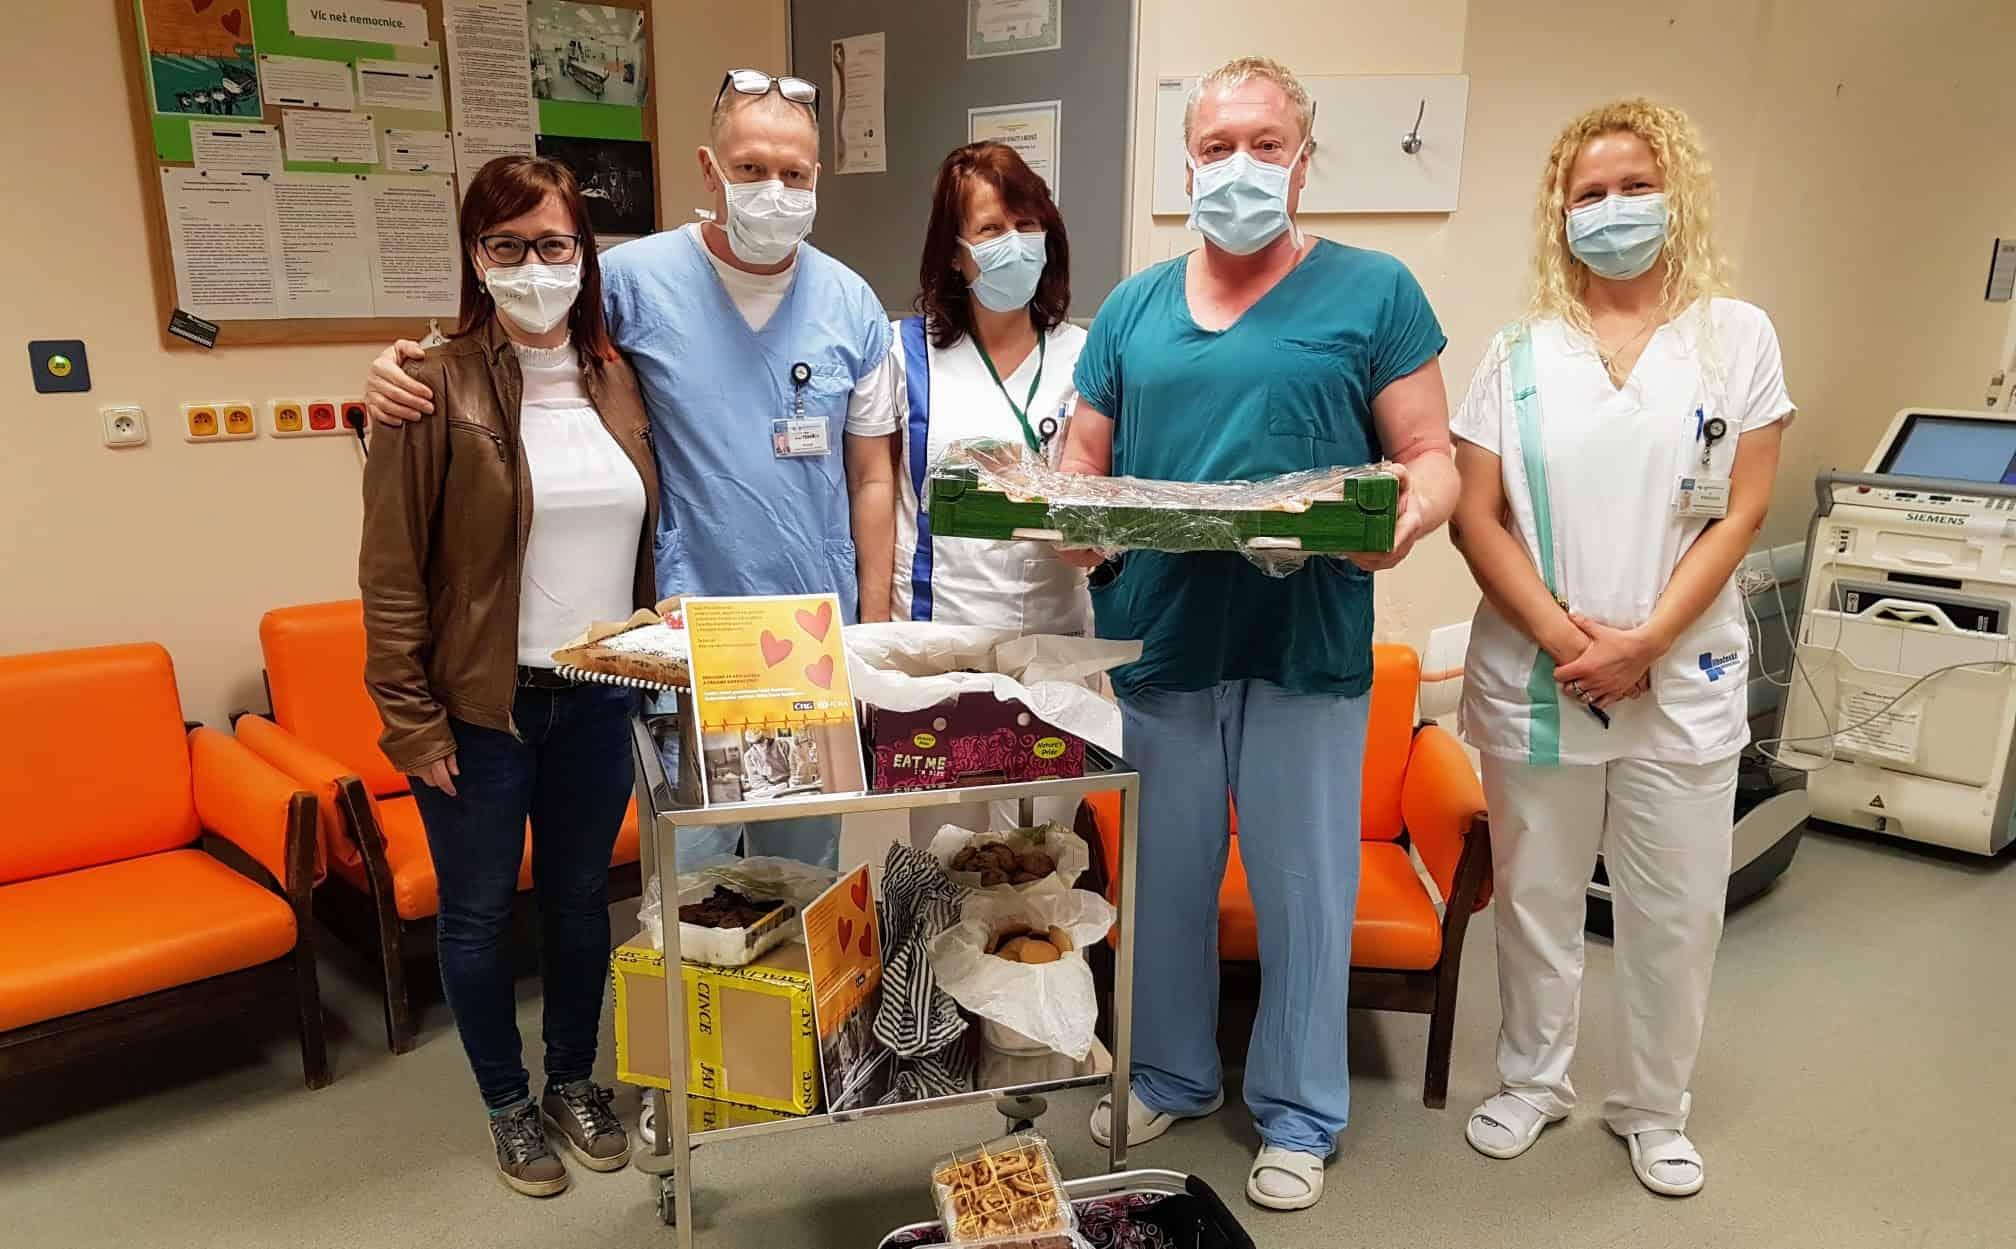 DRA_CB_DCCB_dobrovolnictvi_nemocnice